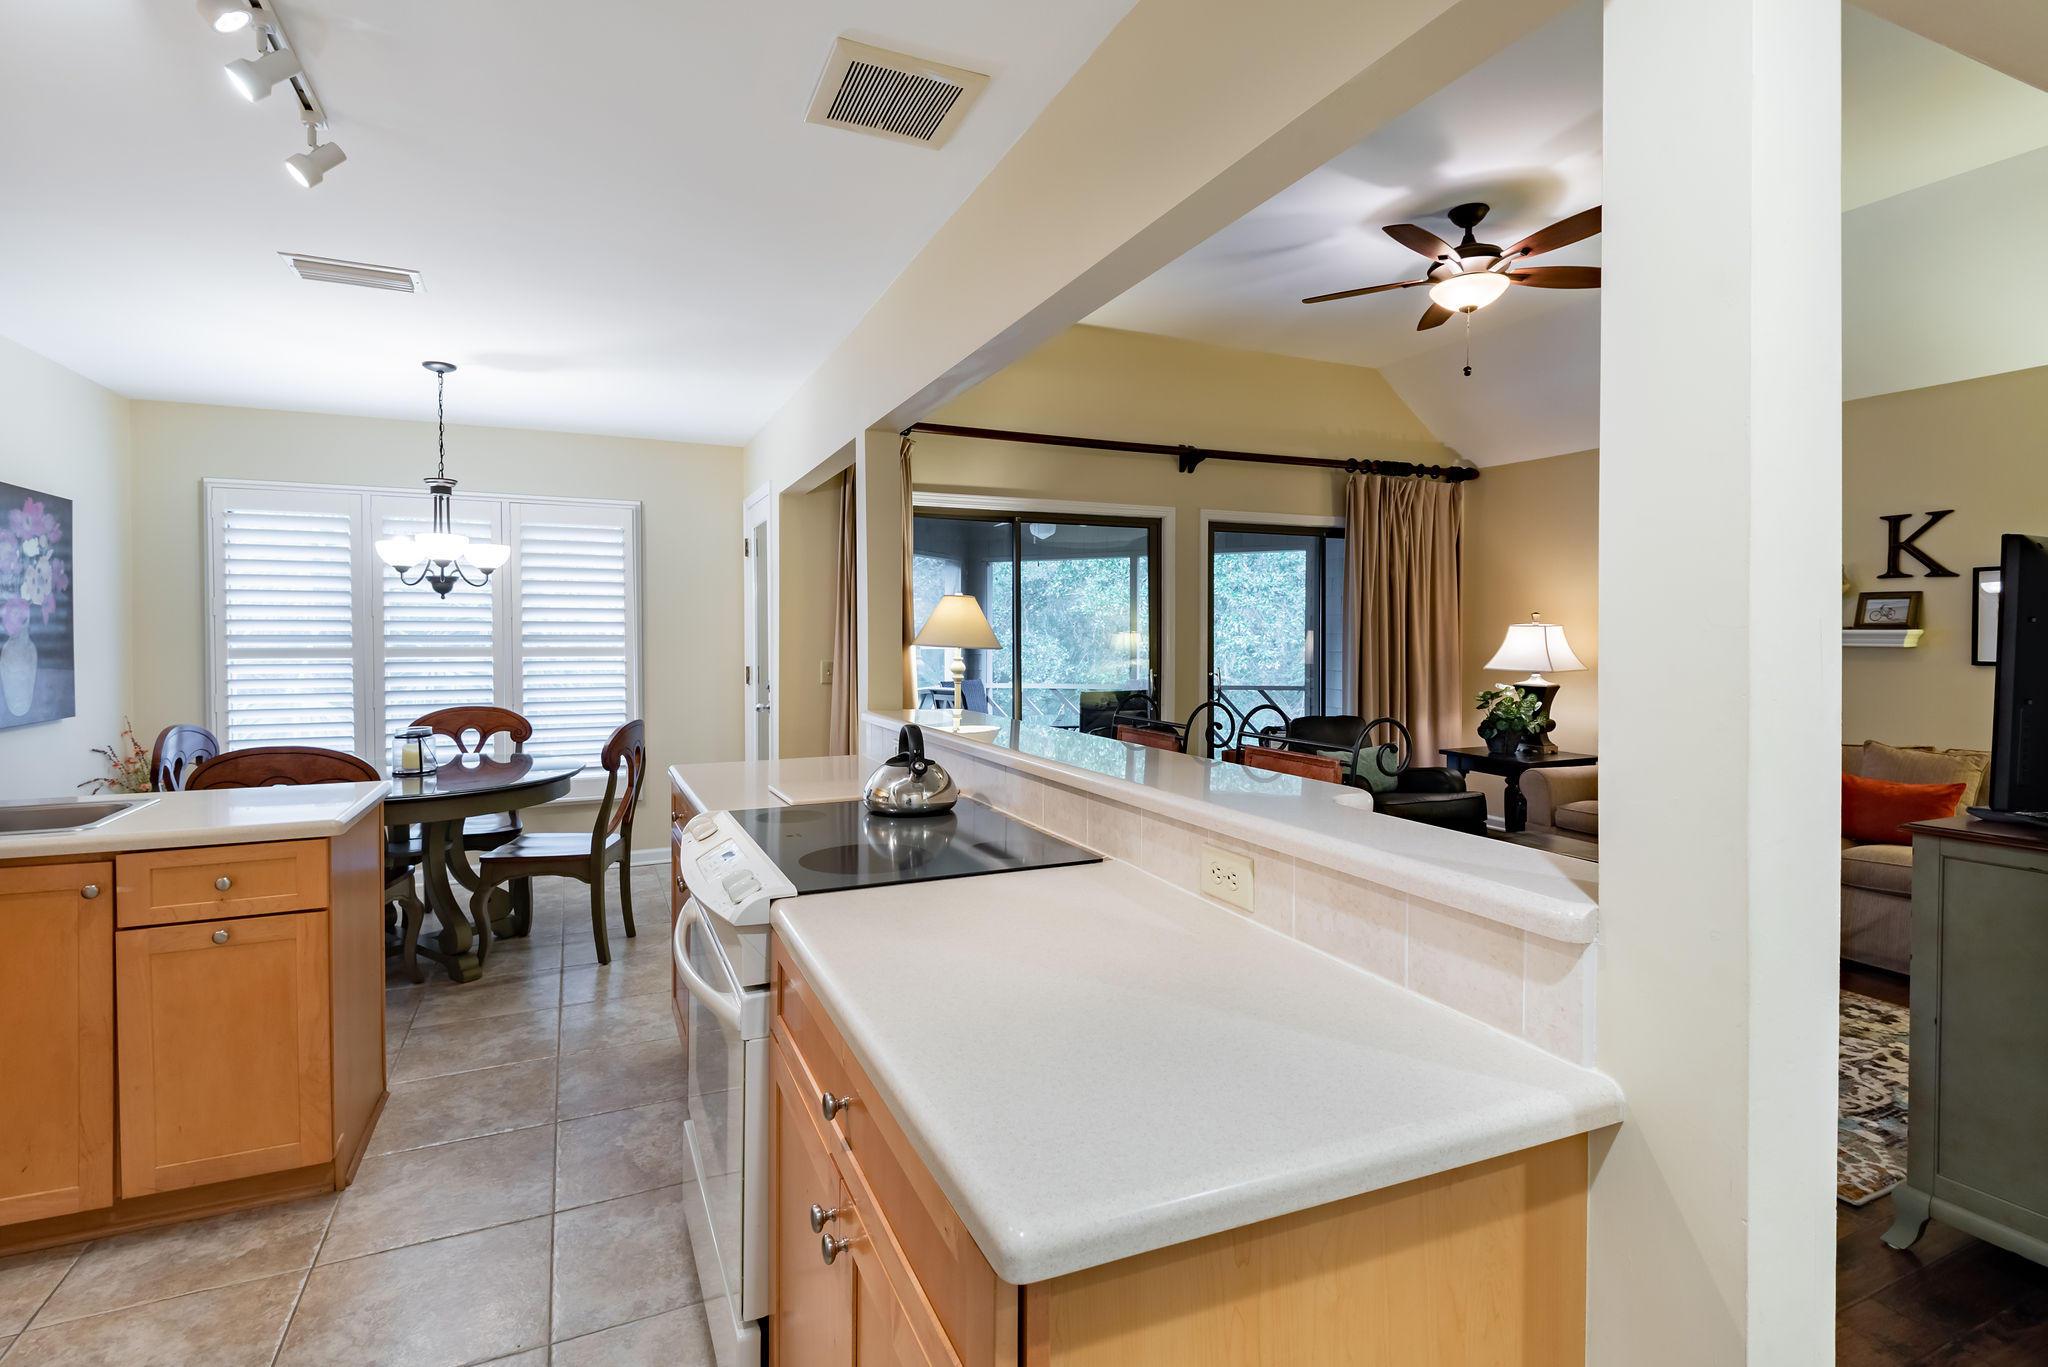 Kiawah Island Homes For Sale - 4660 Tennis Club, Kiawah Island, SC - 16